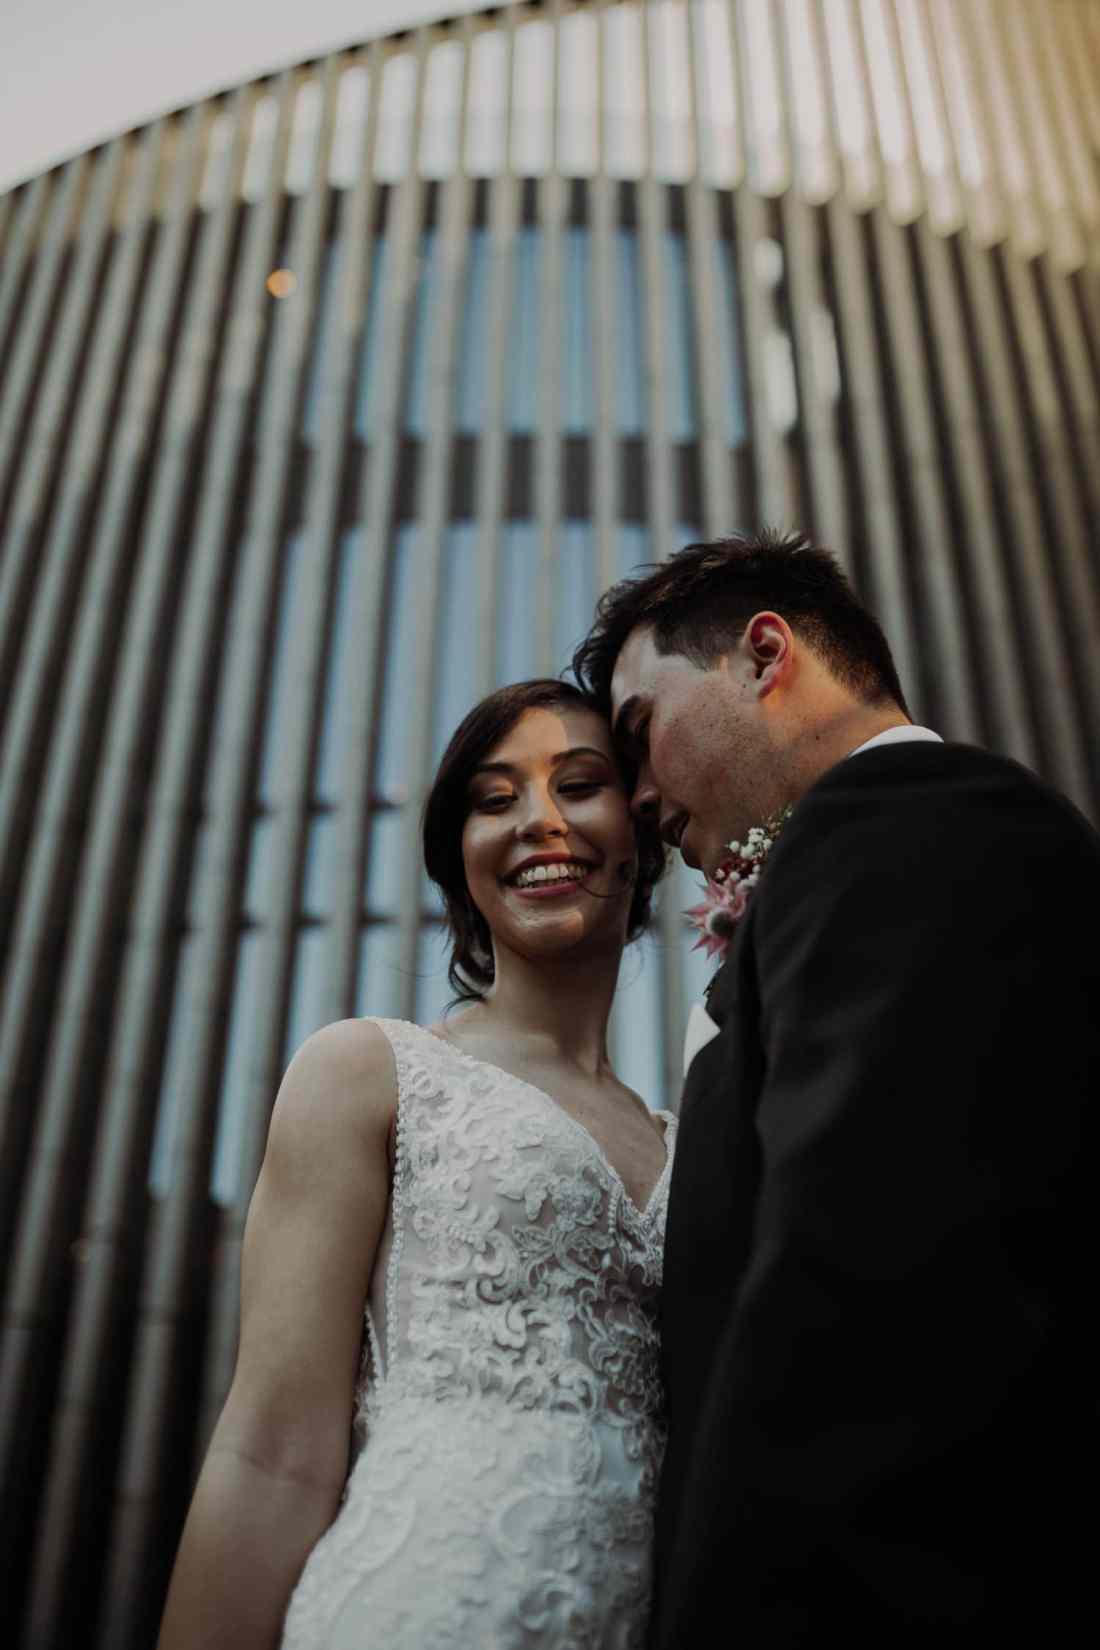 Ebony-Blush-Photography-Perth-Wedding-Photographer-Photography-Film-Sandalford-Winery-Como-Treasury-Wedding-Perth-City-Wedding-Alex-Mel82.jpg